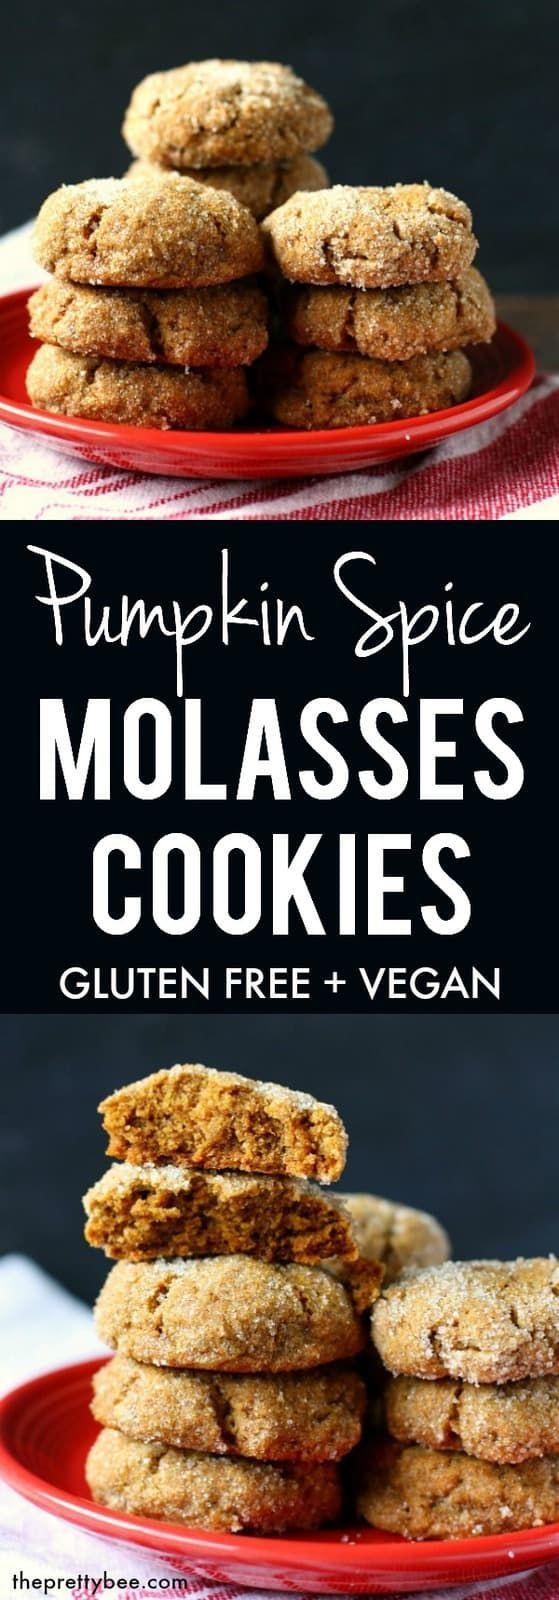 Chewy Pumpkin Spice Molasses Cookies (Gluten Free, Vegan) #glutenfree